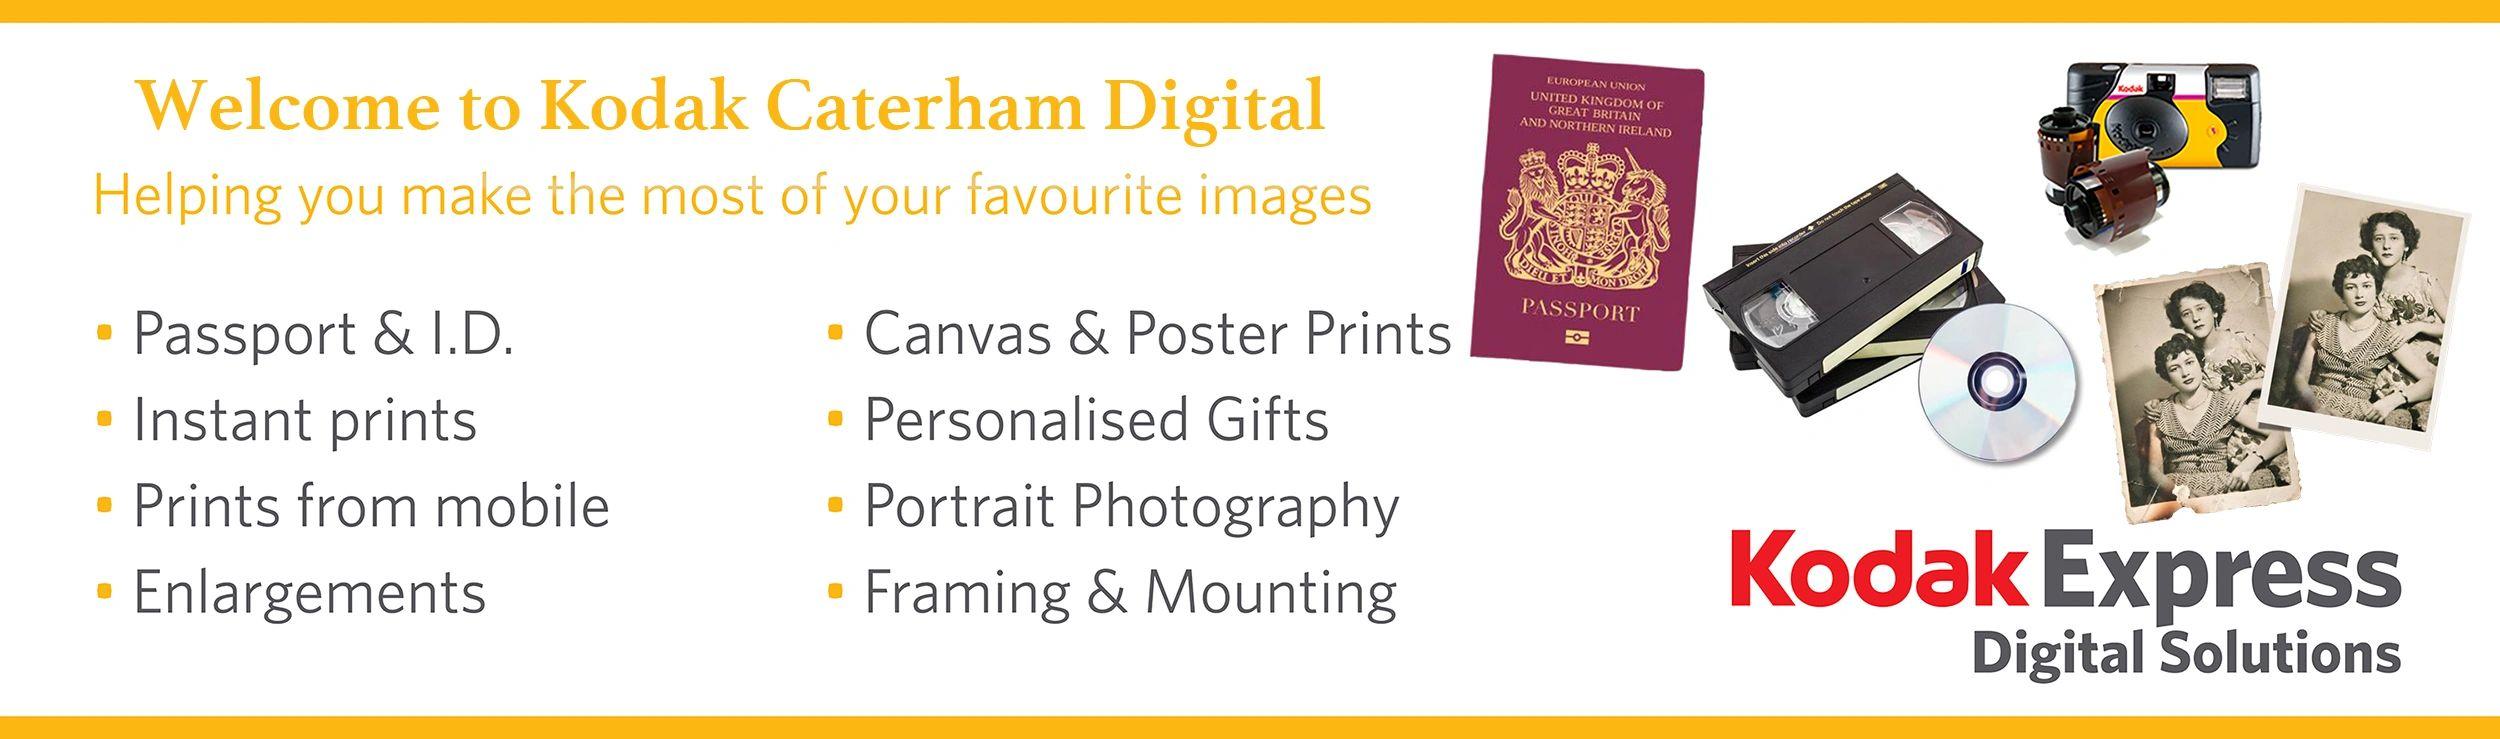 Kodak Caterham Digital - Photography Shop, Photo Printing